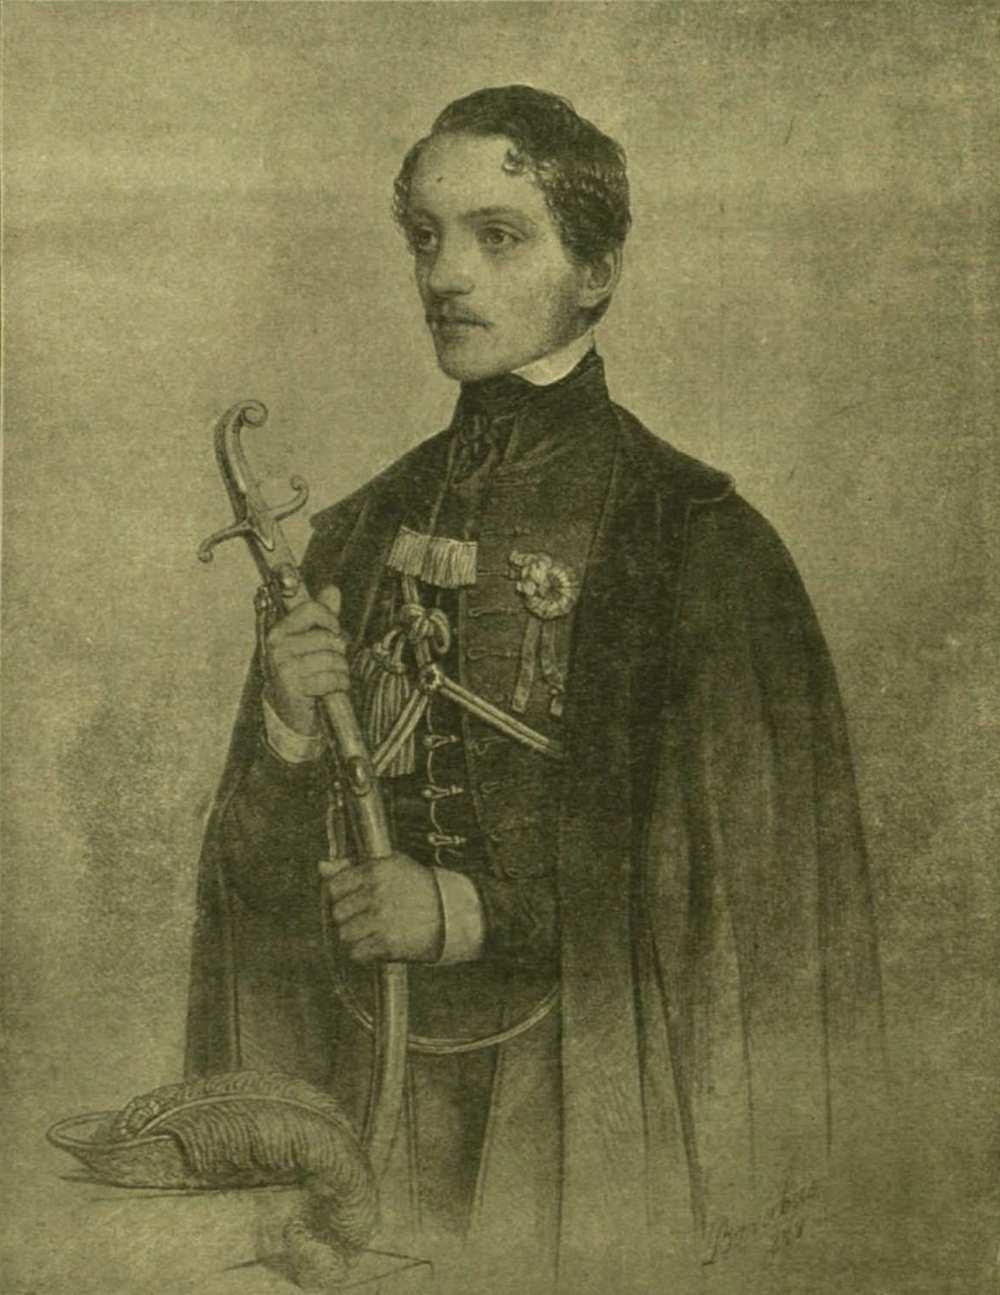 3_vasvari_pal_portreja_barabas_miklos_muve_vasarnapi_ujsag_1899_30_sz_501_opti.jpg